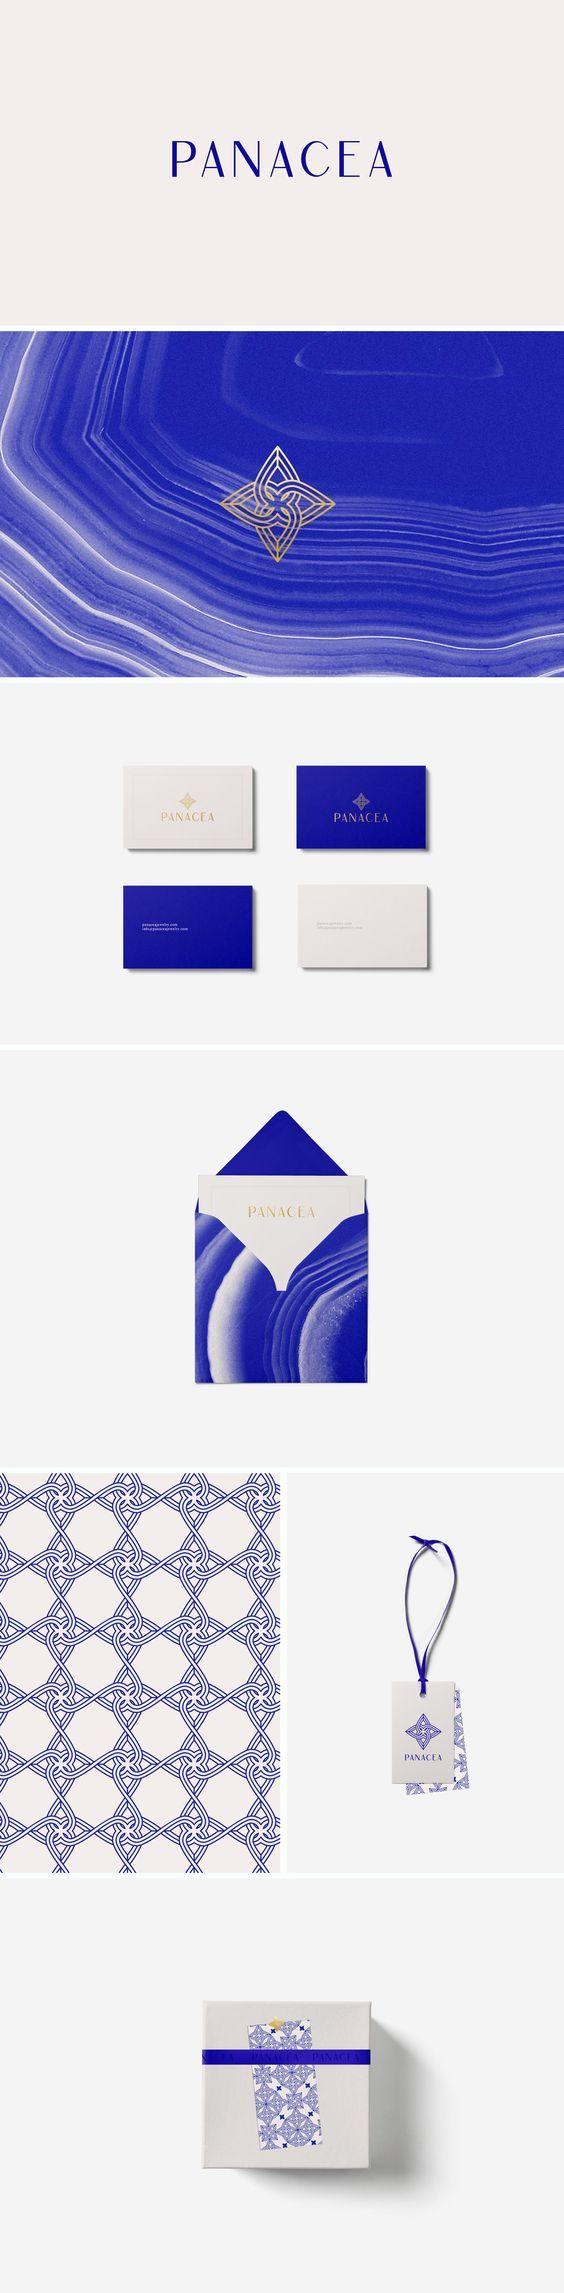 Panacea Branding by Cocorrina | Fivestar Branding – Design and Branding Agency & Inspiration Gallery